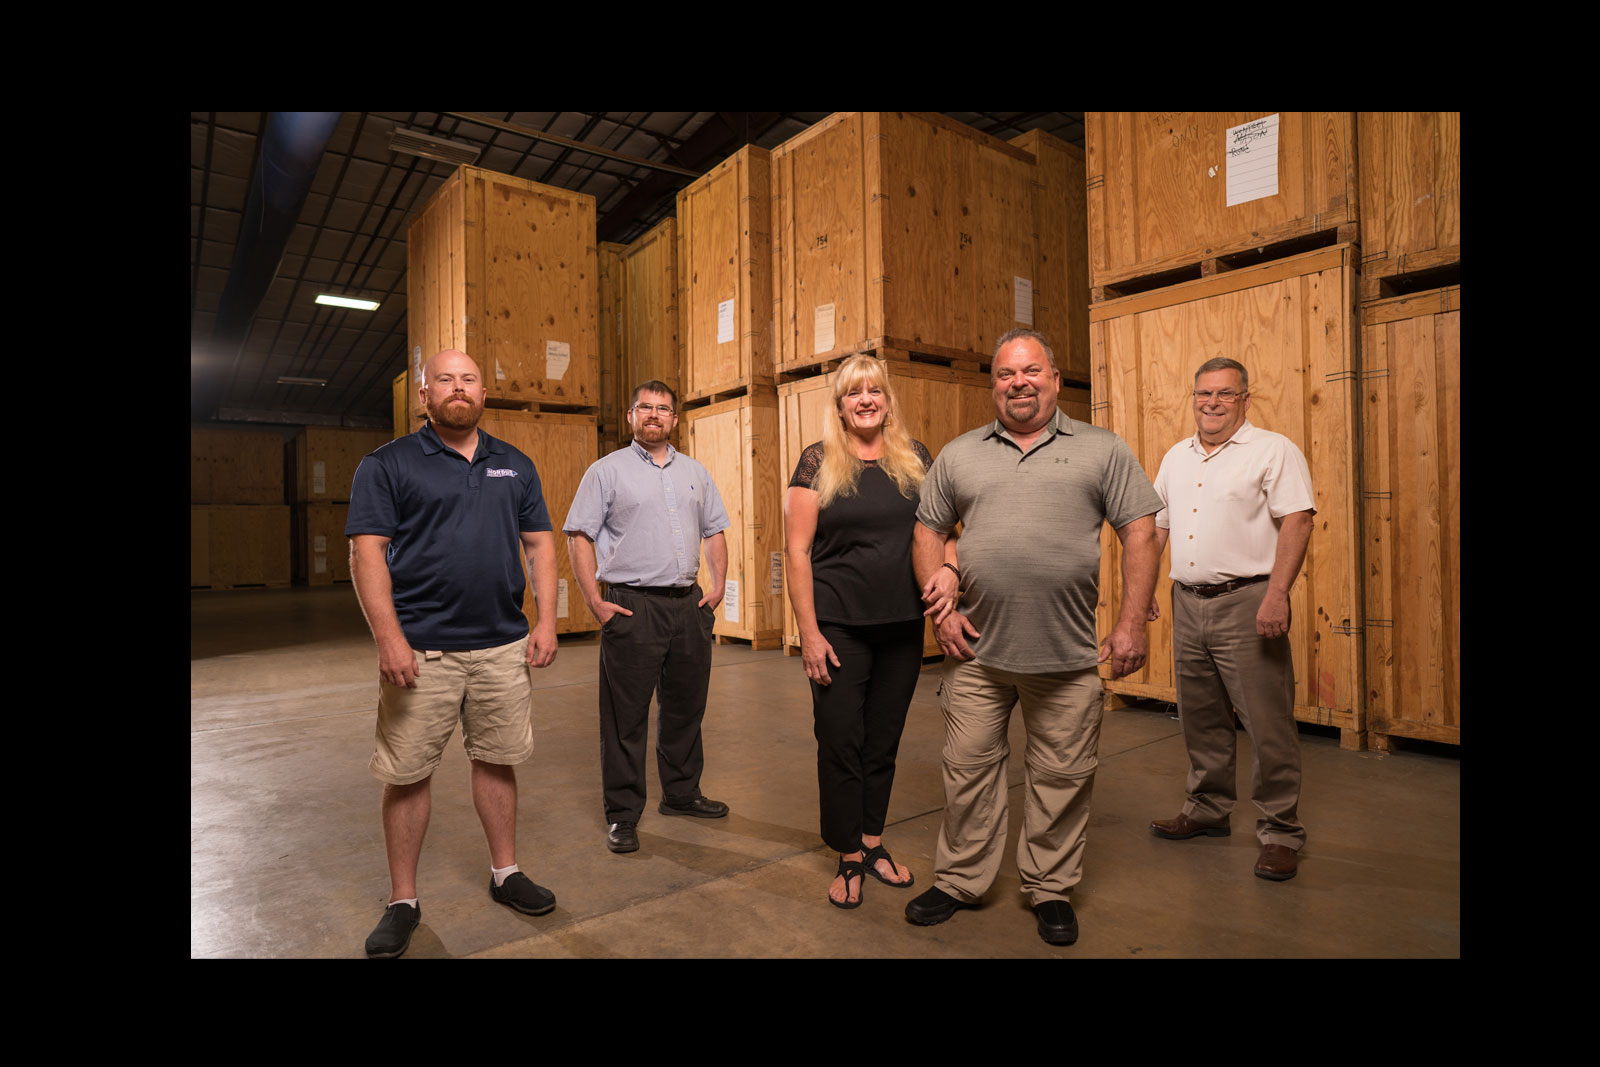 Mordue Moving & Storage - Legacy